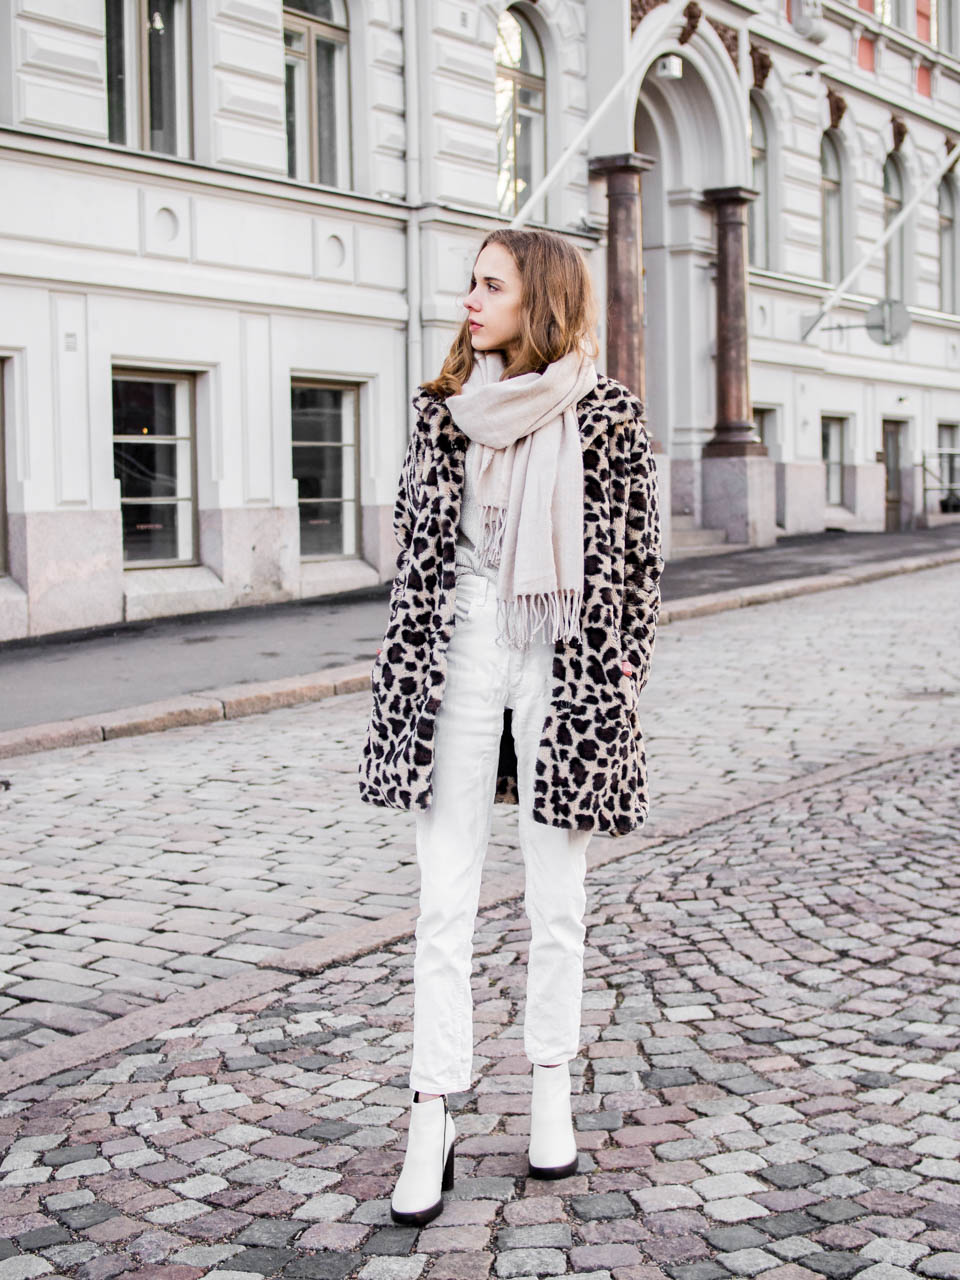 Winter outfit with faux fur leopard coat - Talvimuoti, leoparditakki